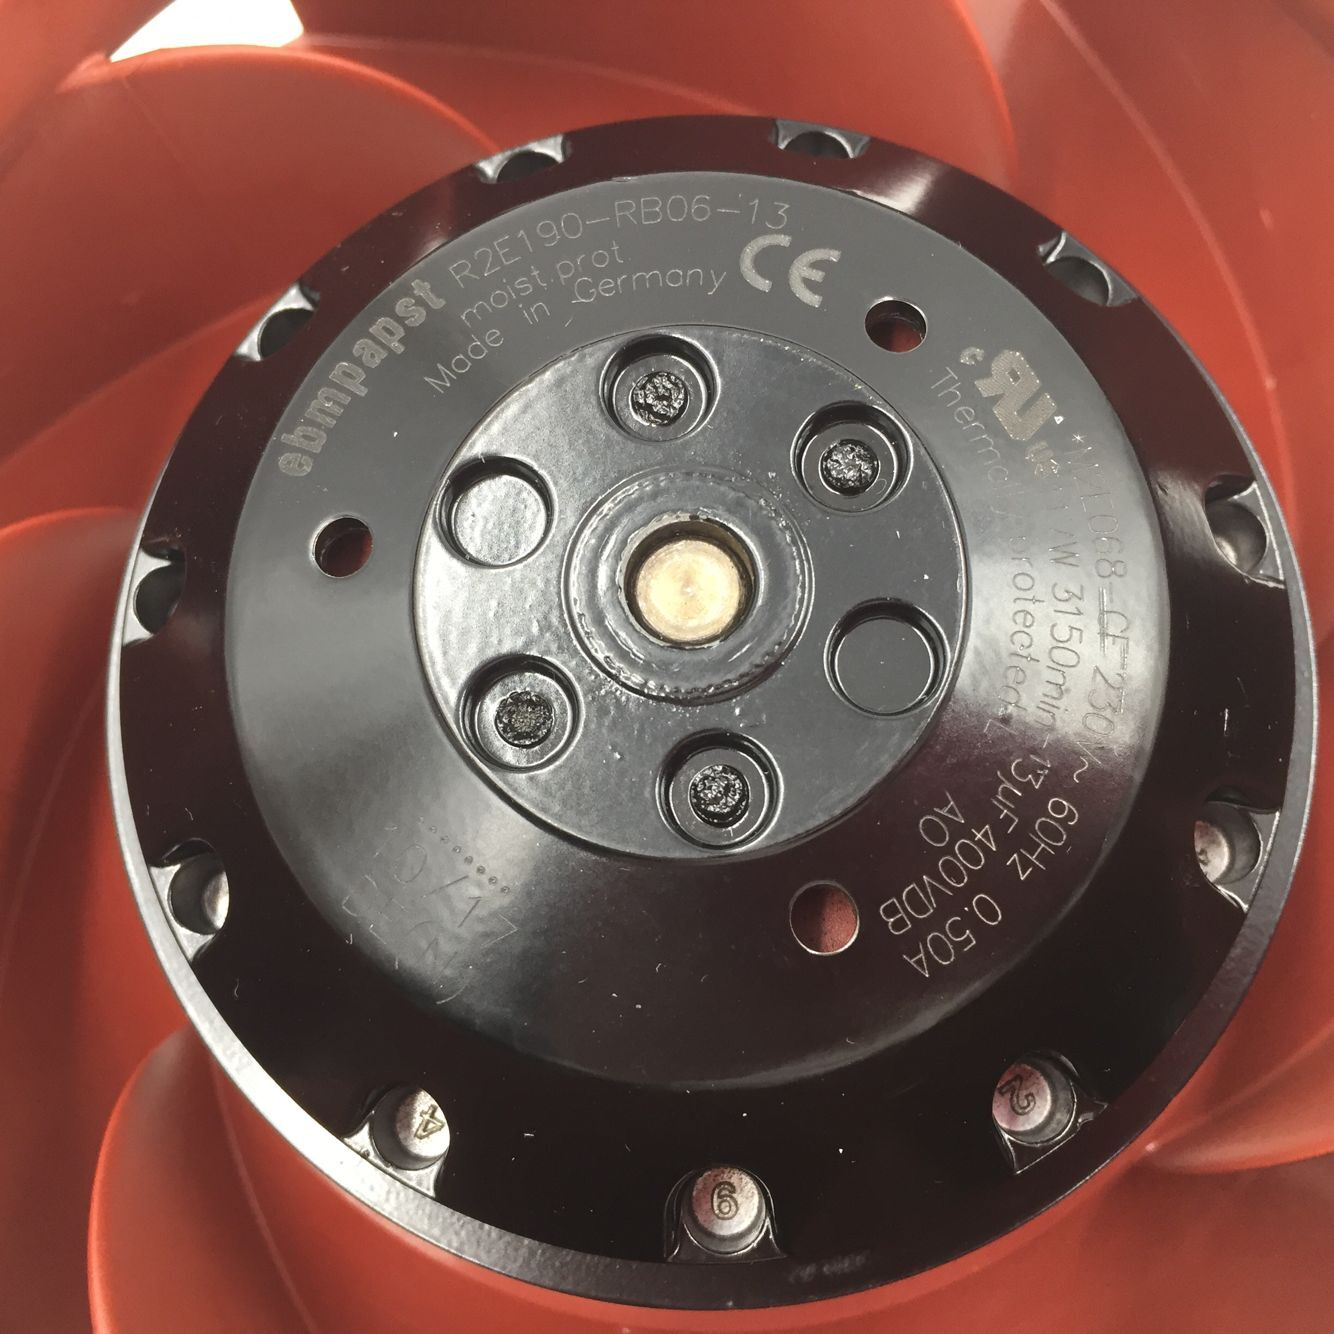 R2E190-RB06-13 Fan ebmpapst for Replace R2E190-AF58-13 Original #MF72 QL